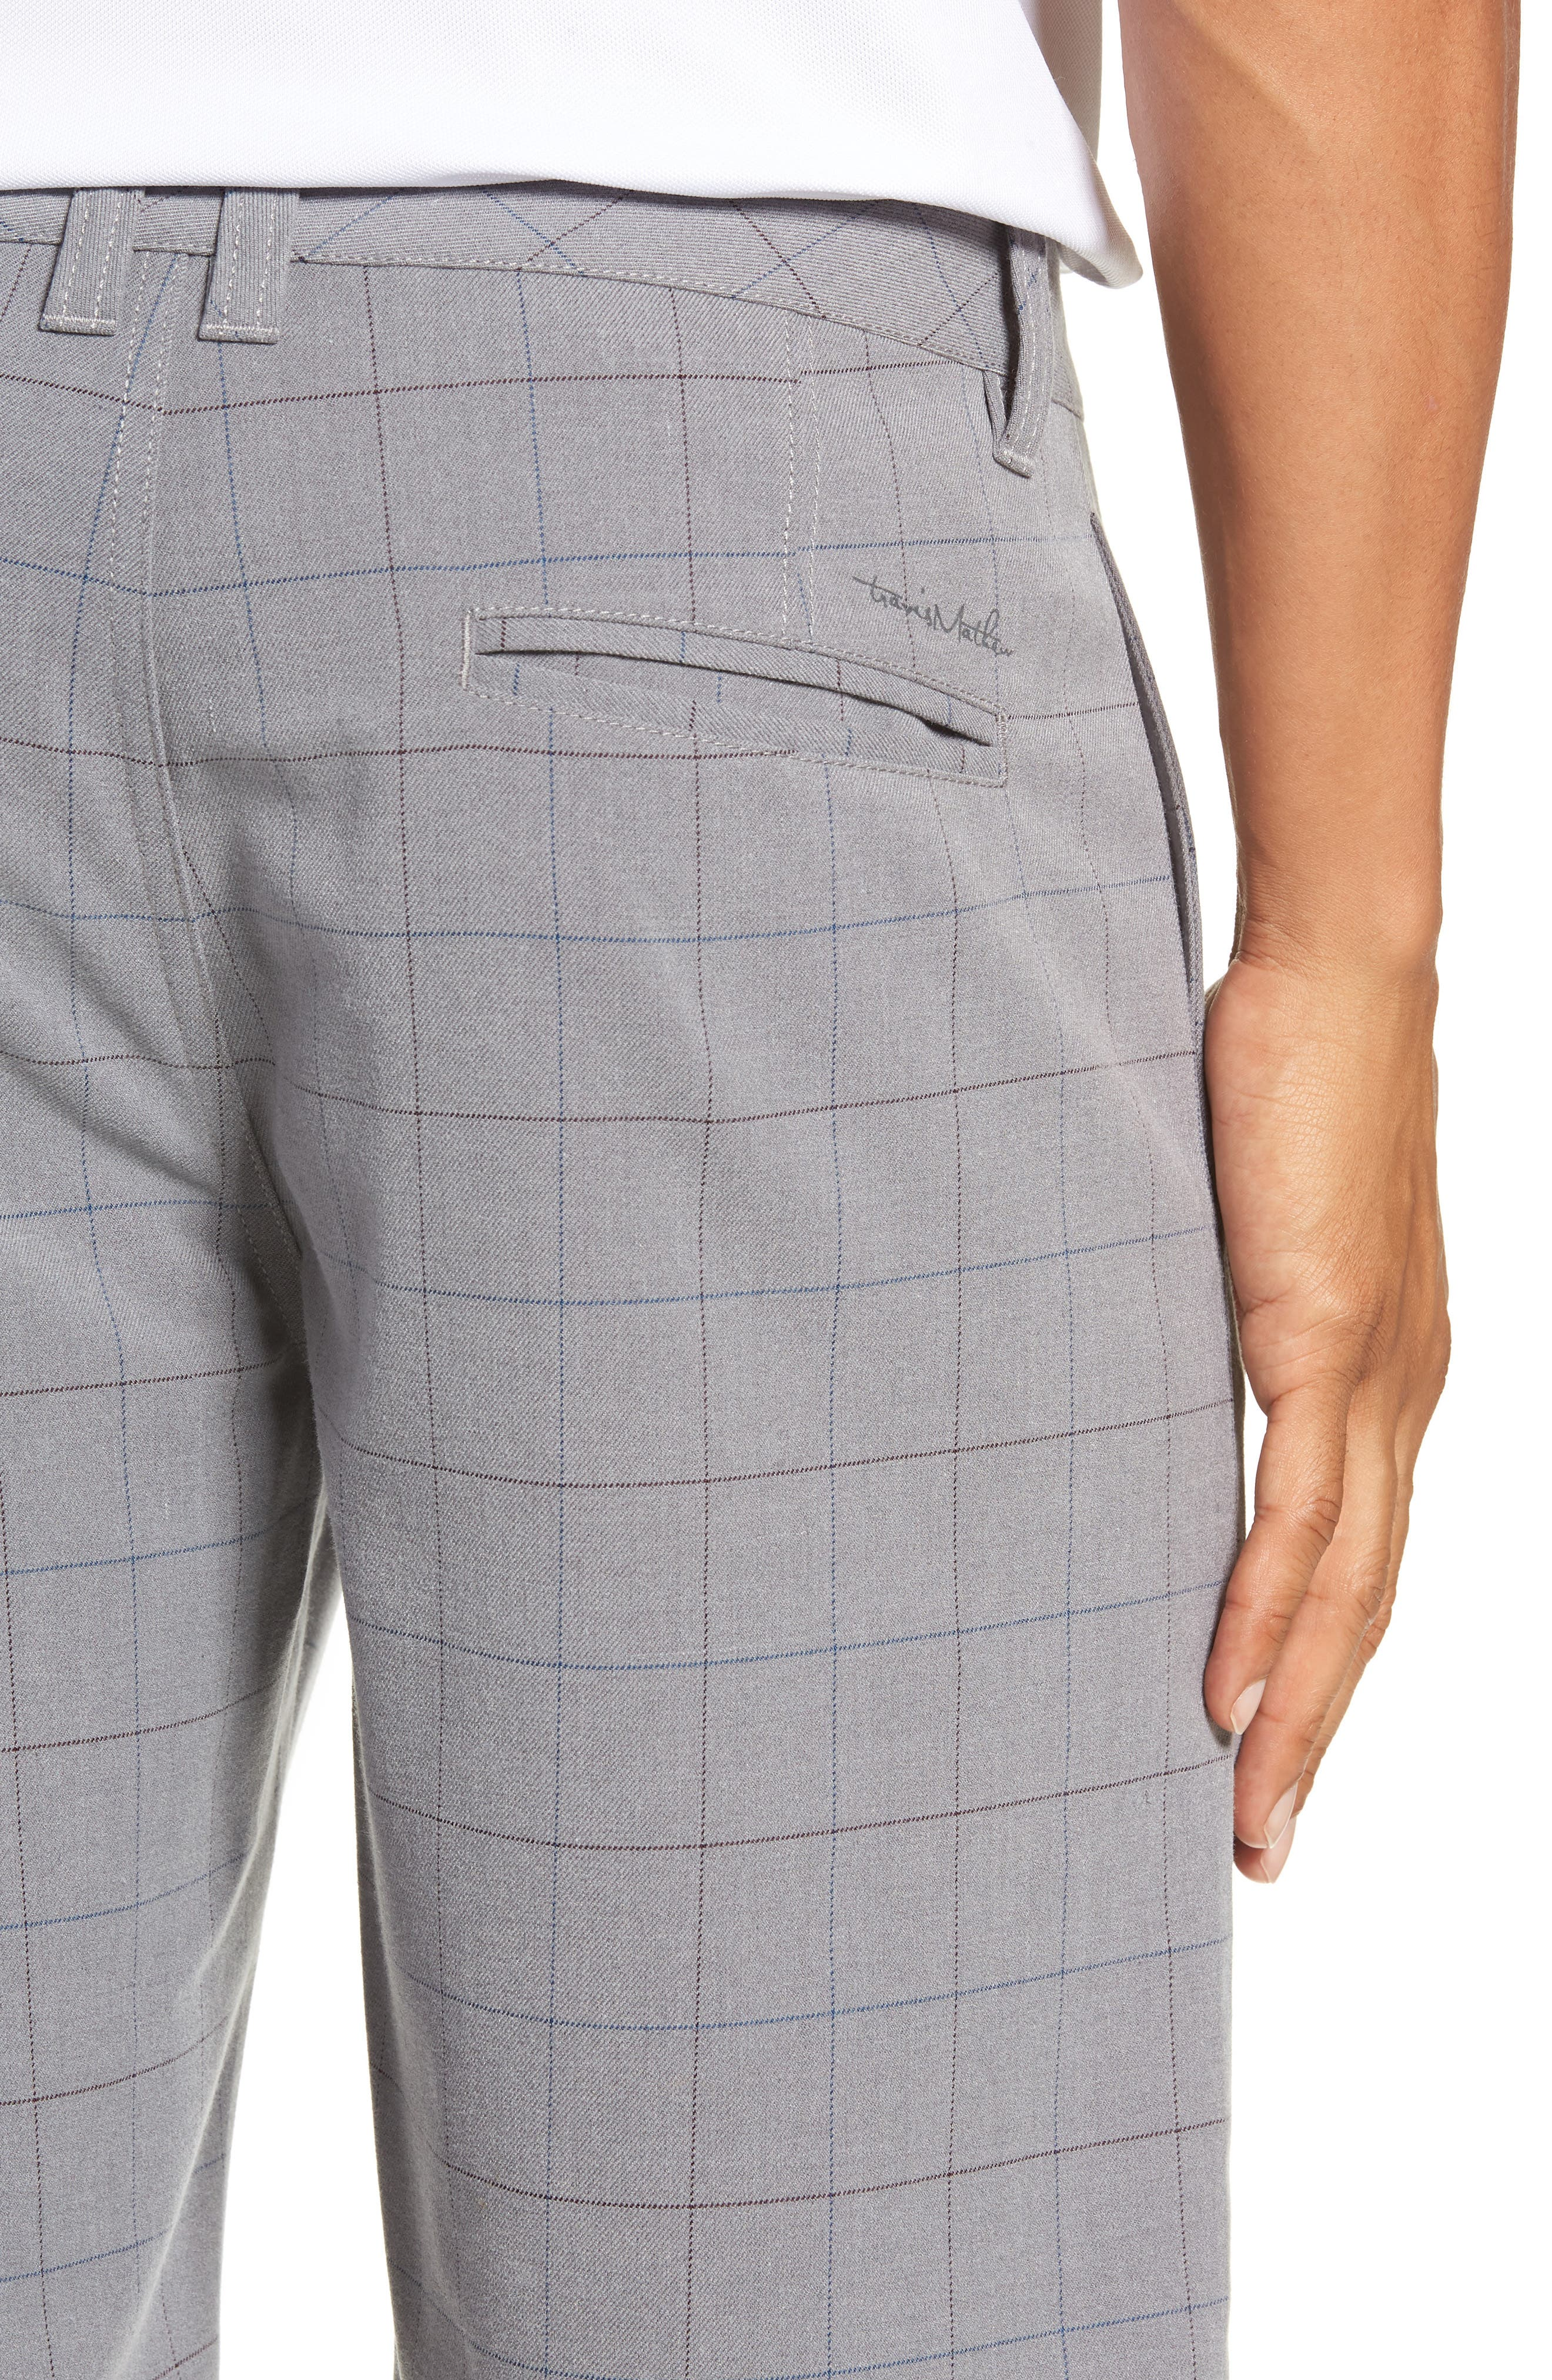 Rickles Regular Fit Shorts,                             Alternate thumbnail 4, color,                             HEATHER SHARKSKIN